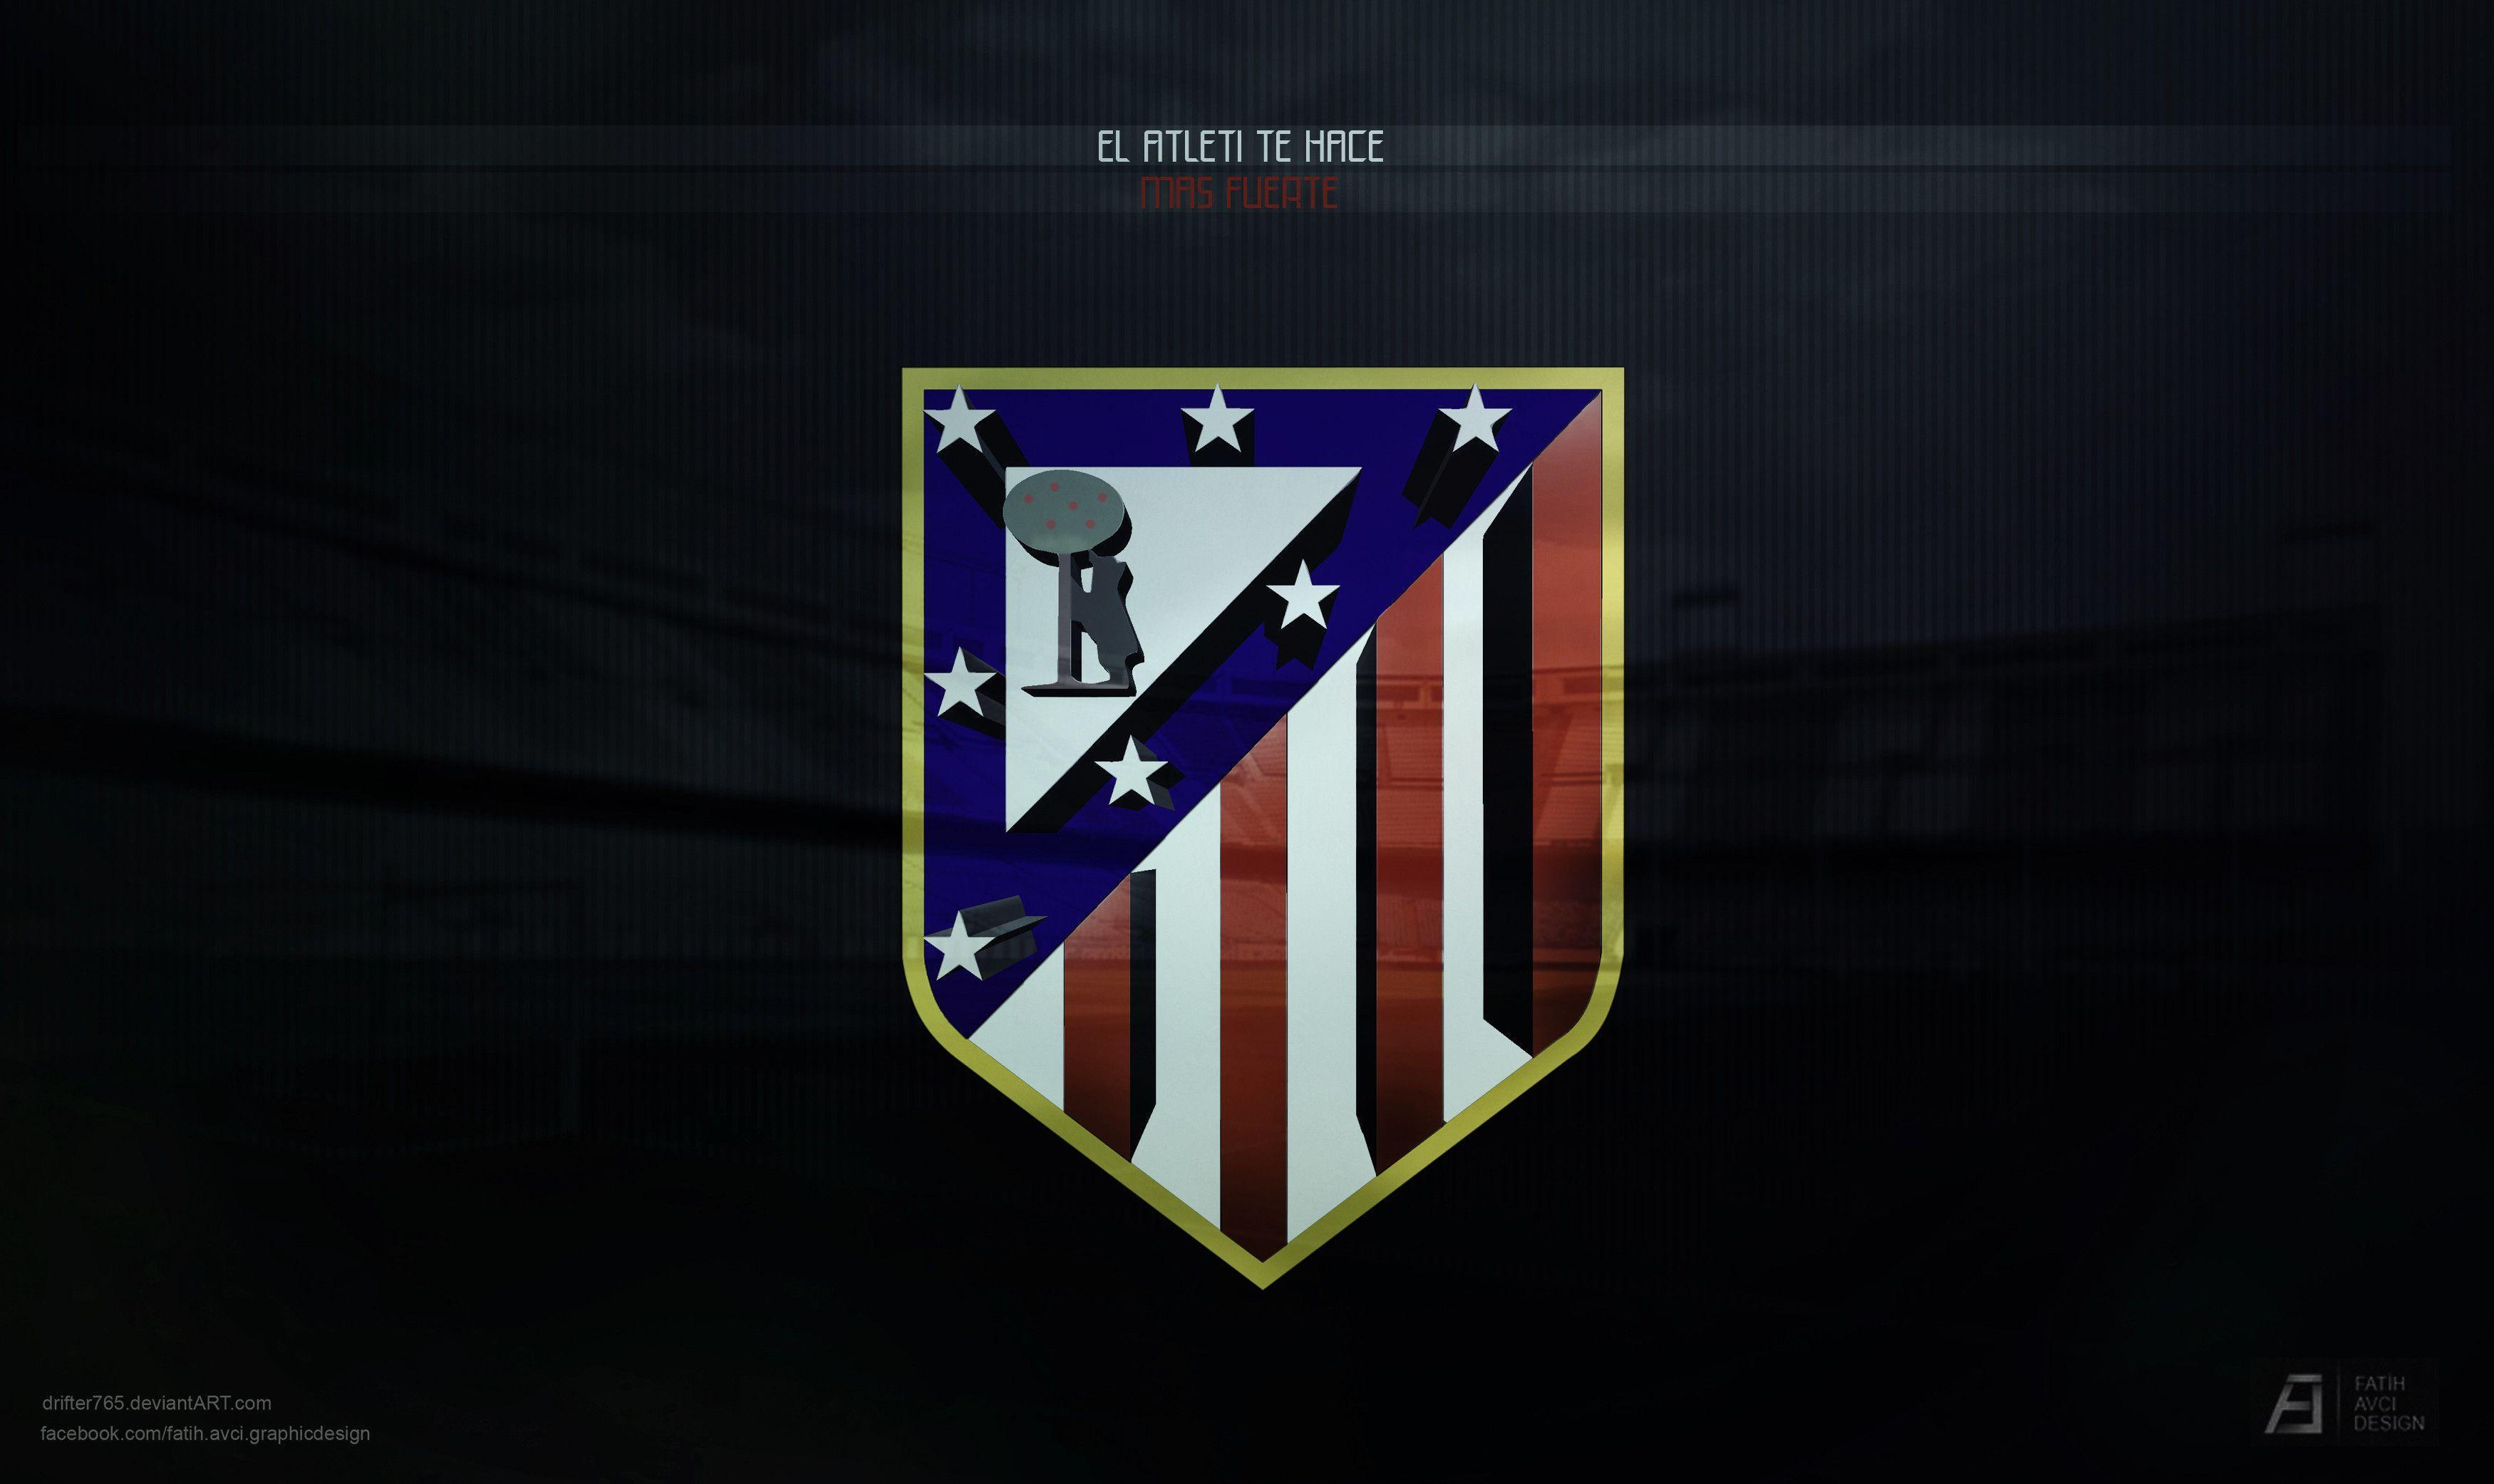 Atletico madrid logo HD wallpaper backgrounds desktop - FIFA Football